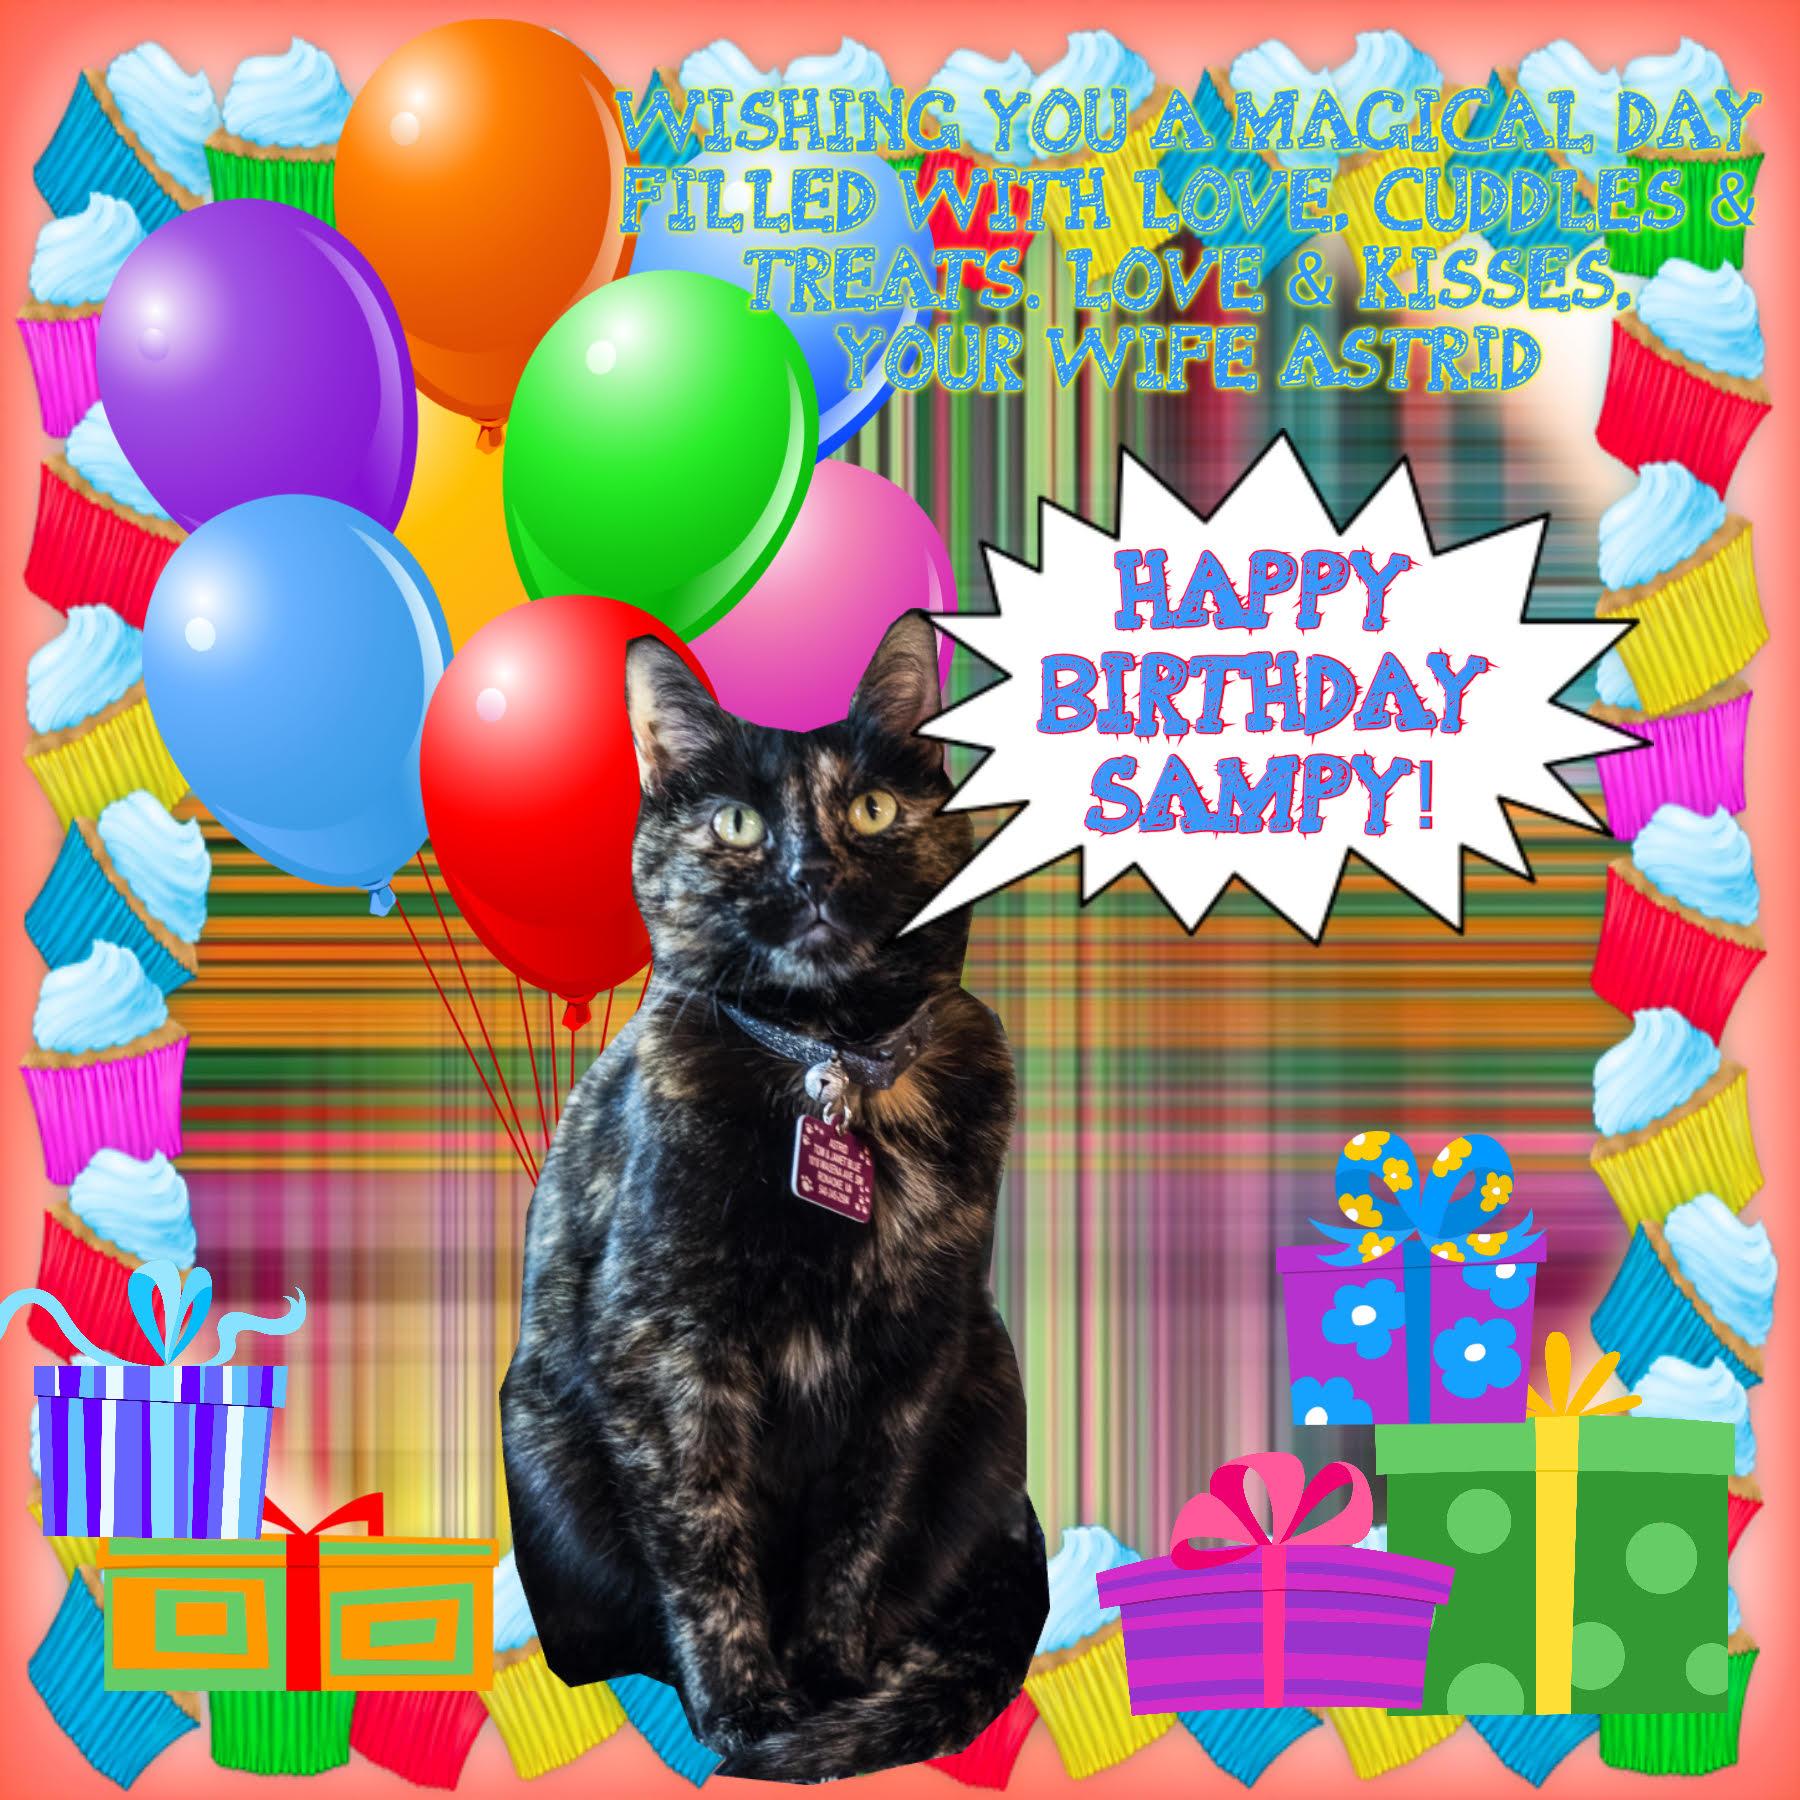 Happy Belated Birthday, Sampson!